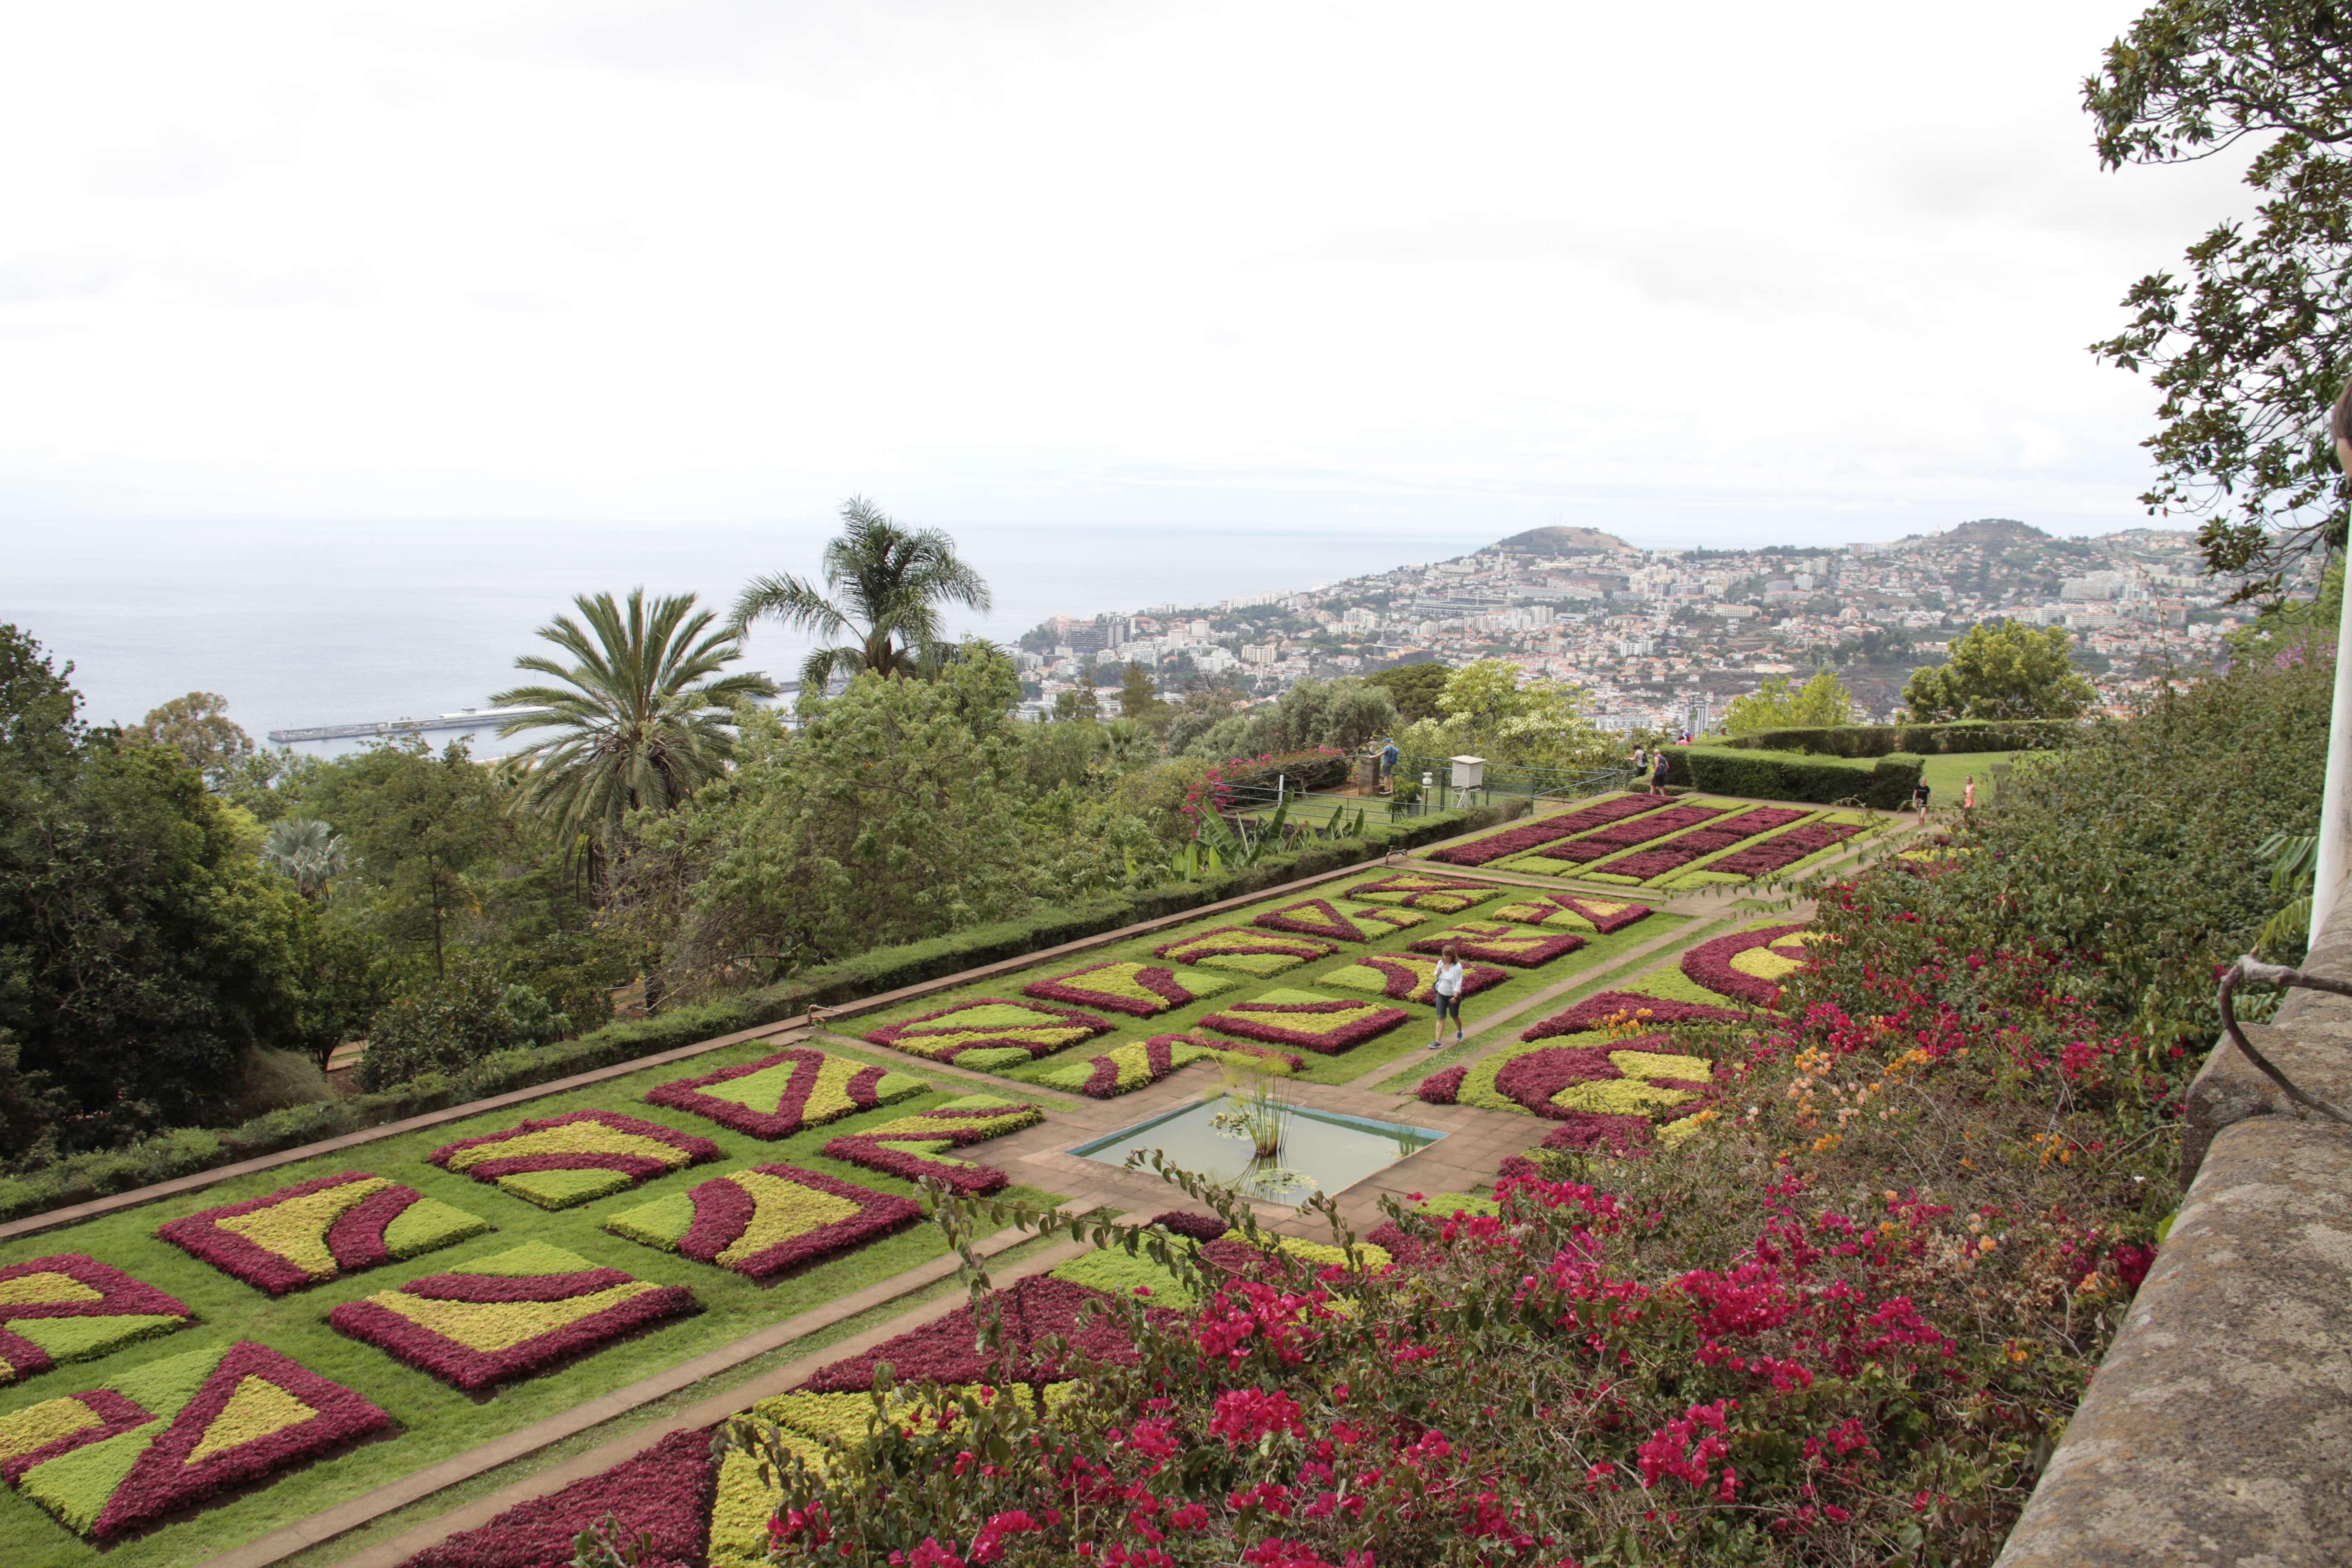 Madere aout 2019_0158 Funchal Jardim botanico